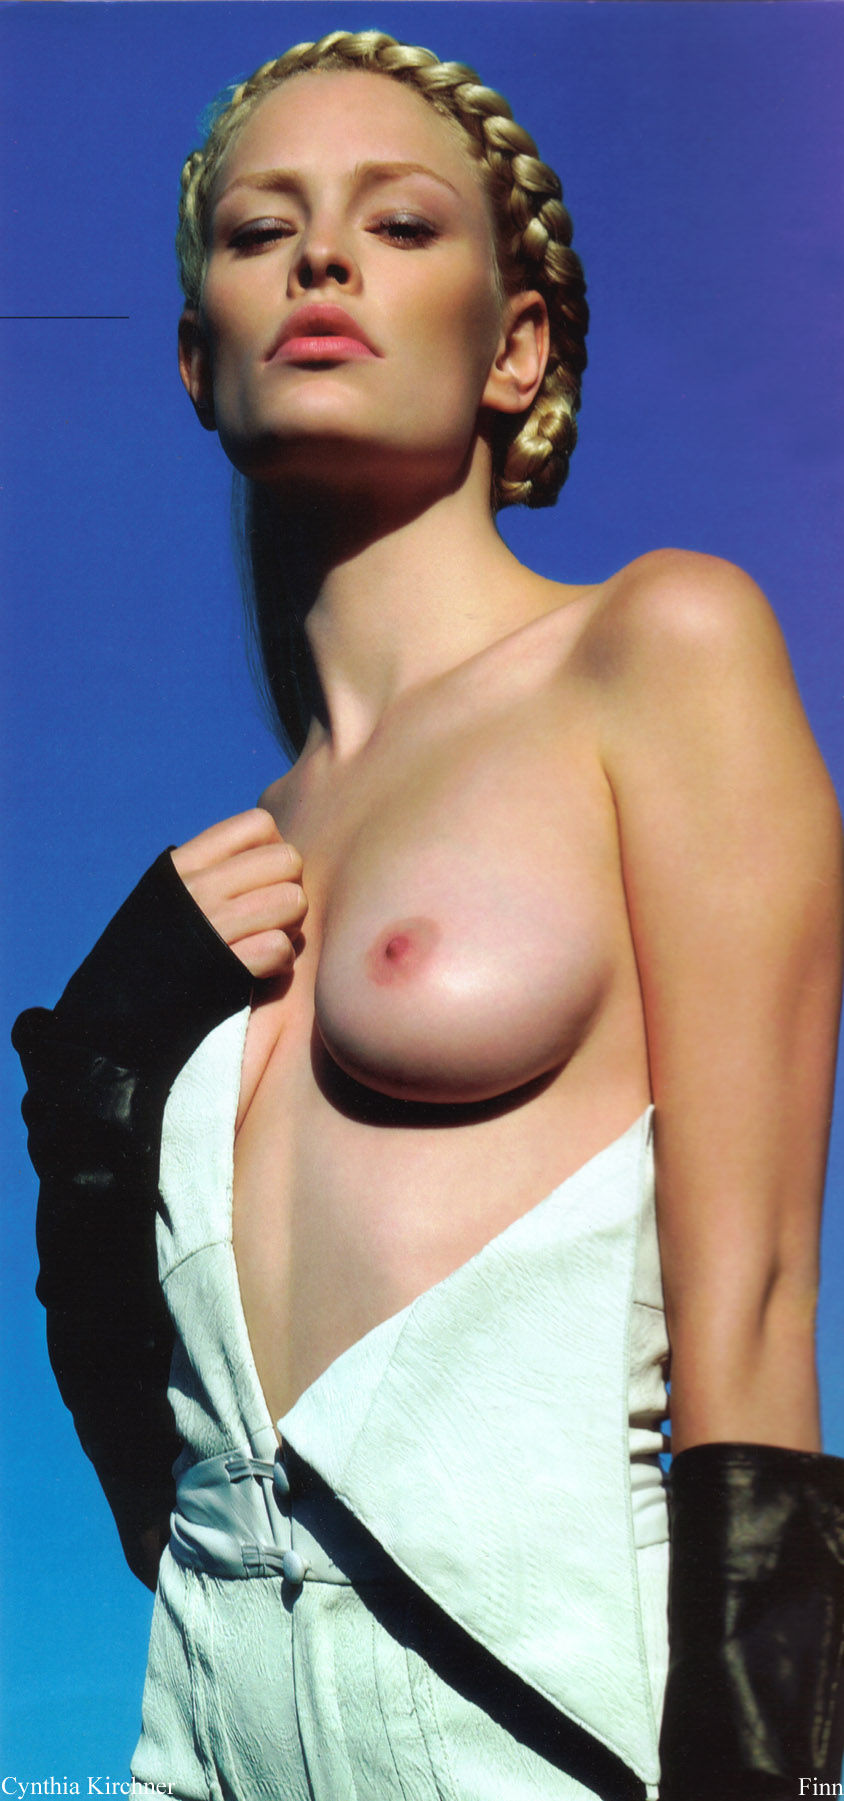 cynthia kirchner nude